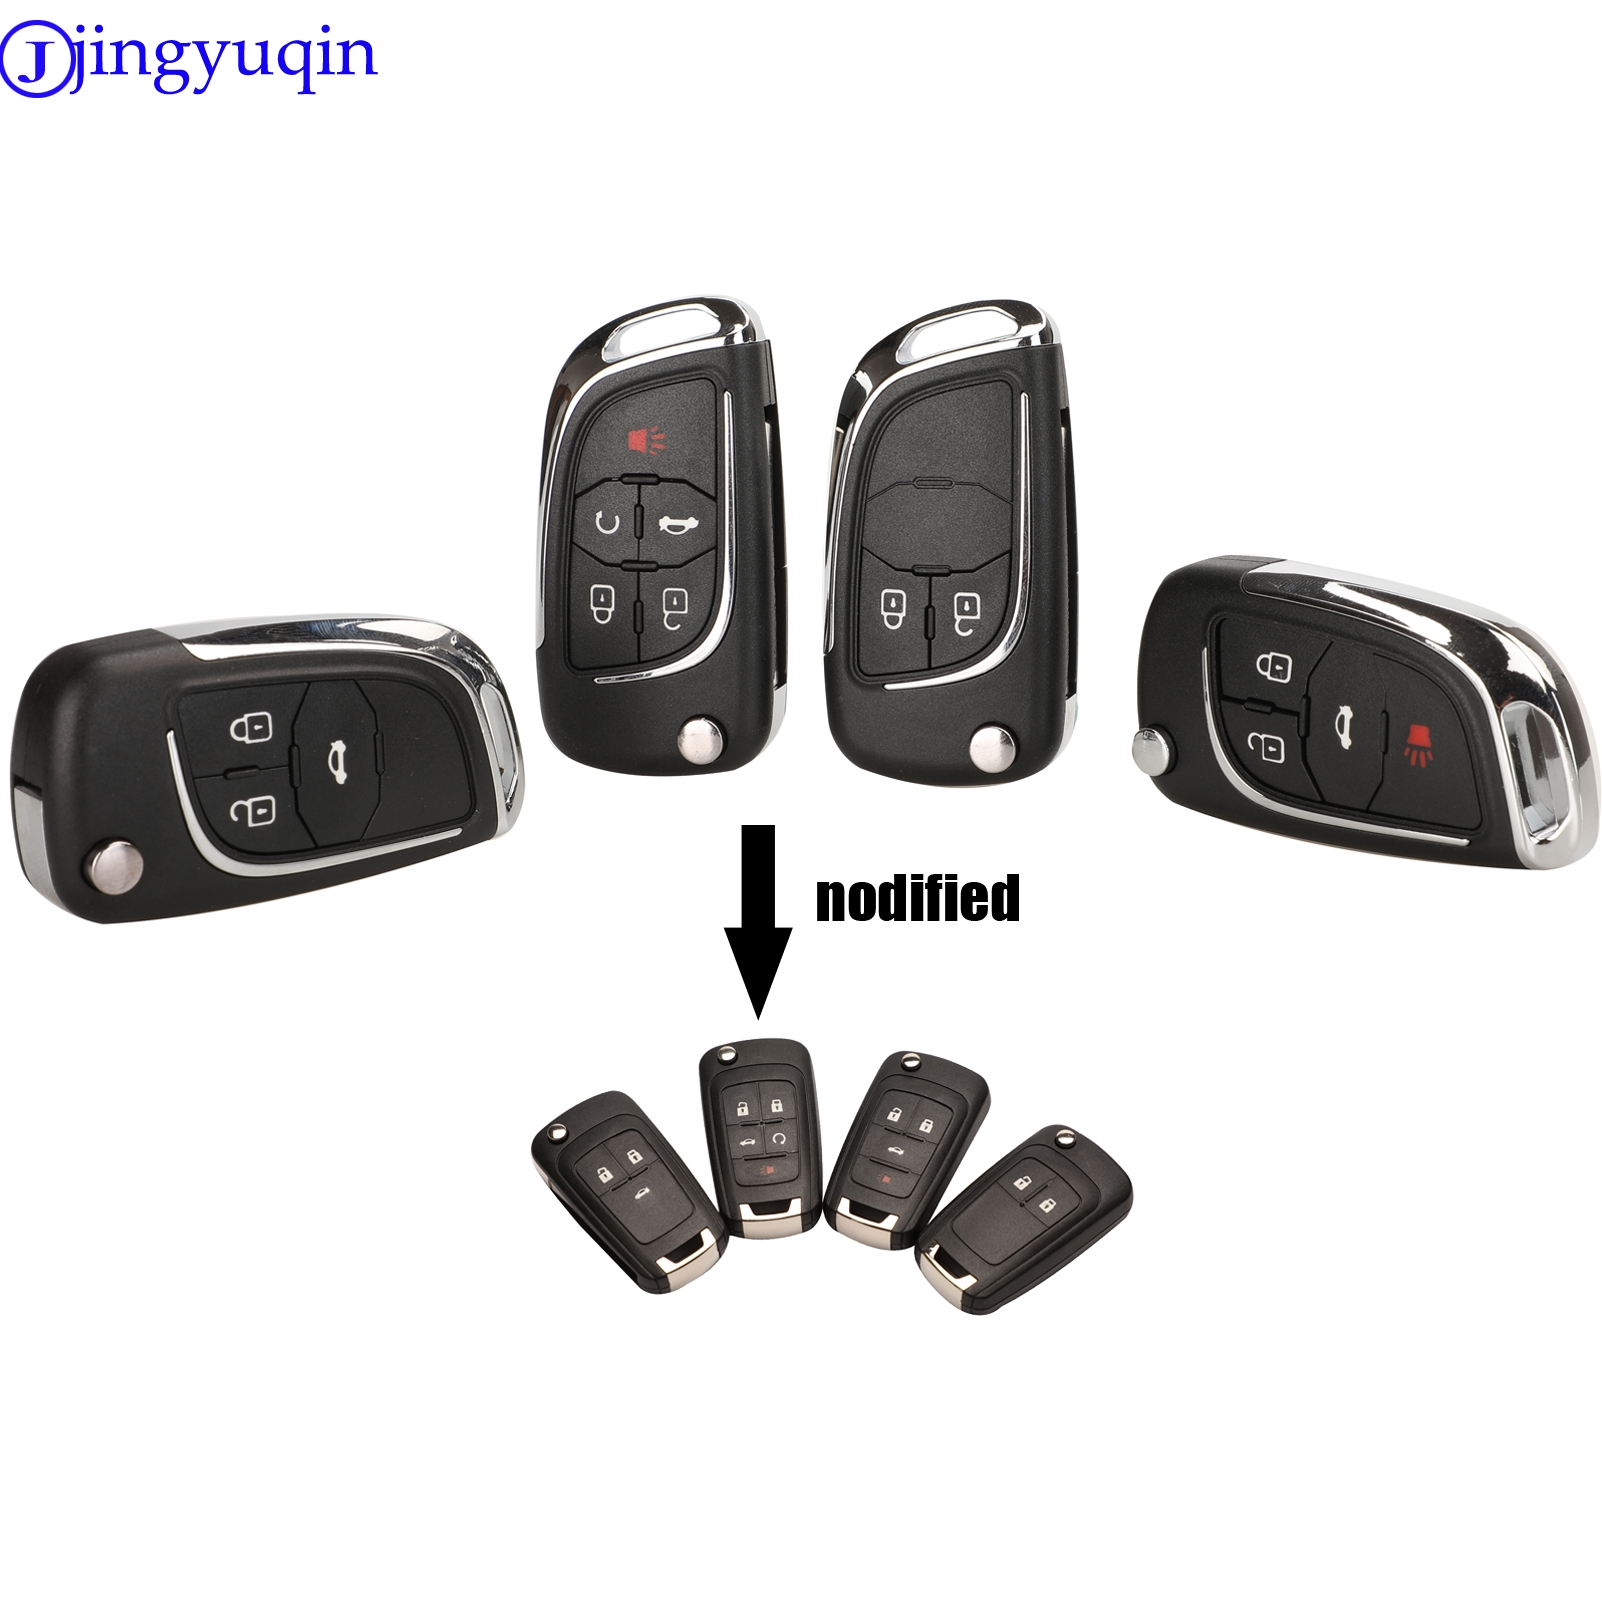 Jingyuqin Modified Folding Remote Car Key Shell Fob Case For Chevrolet Cruze Epica Lova Camaro Impala 2 3 4 5 Button HU100 Cover